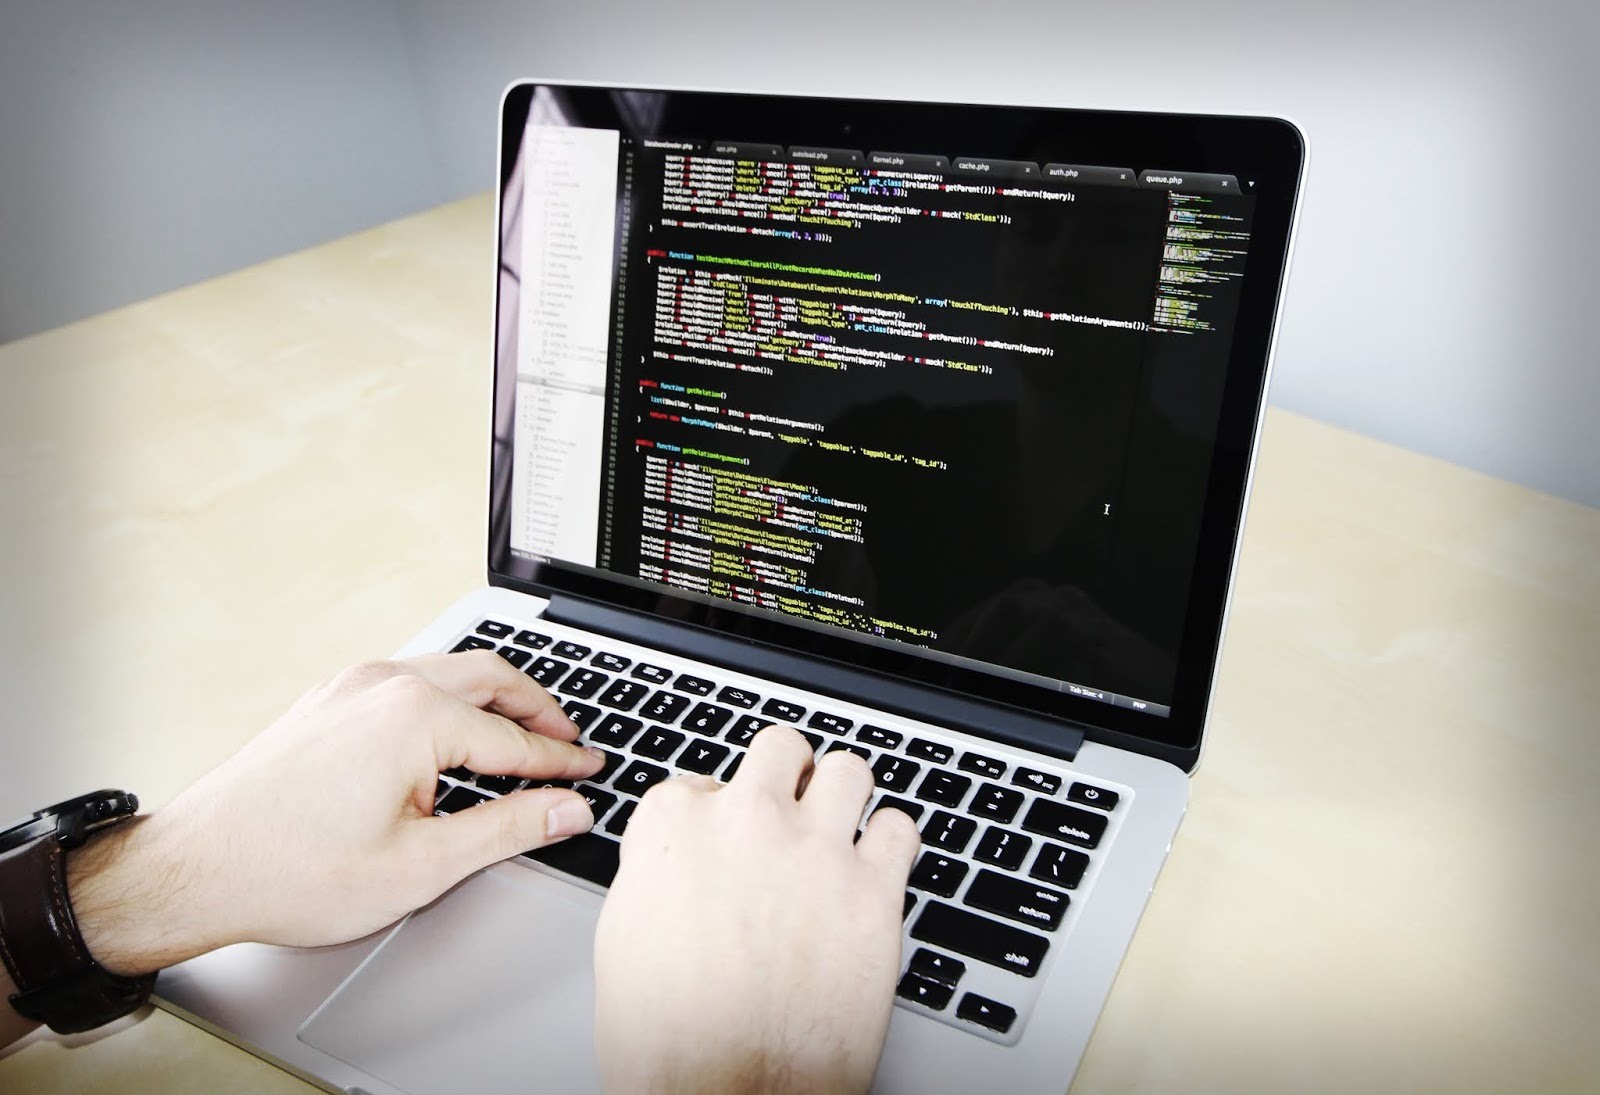 I-migliori-software-gratis